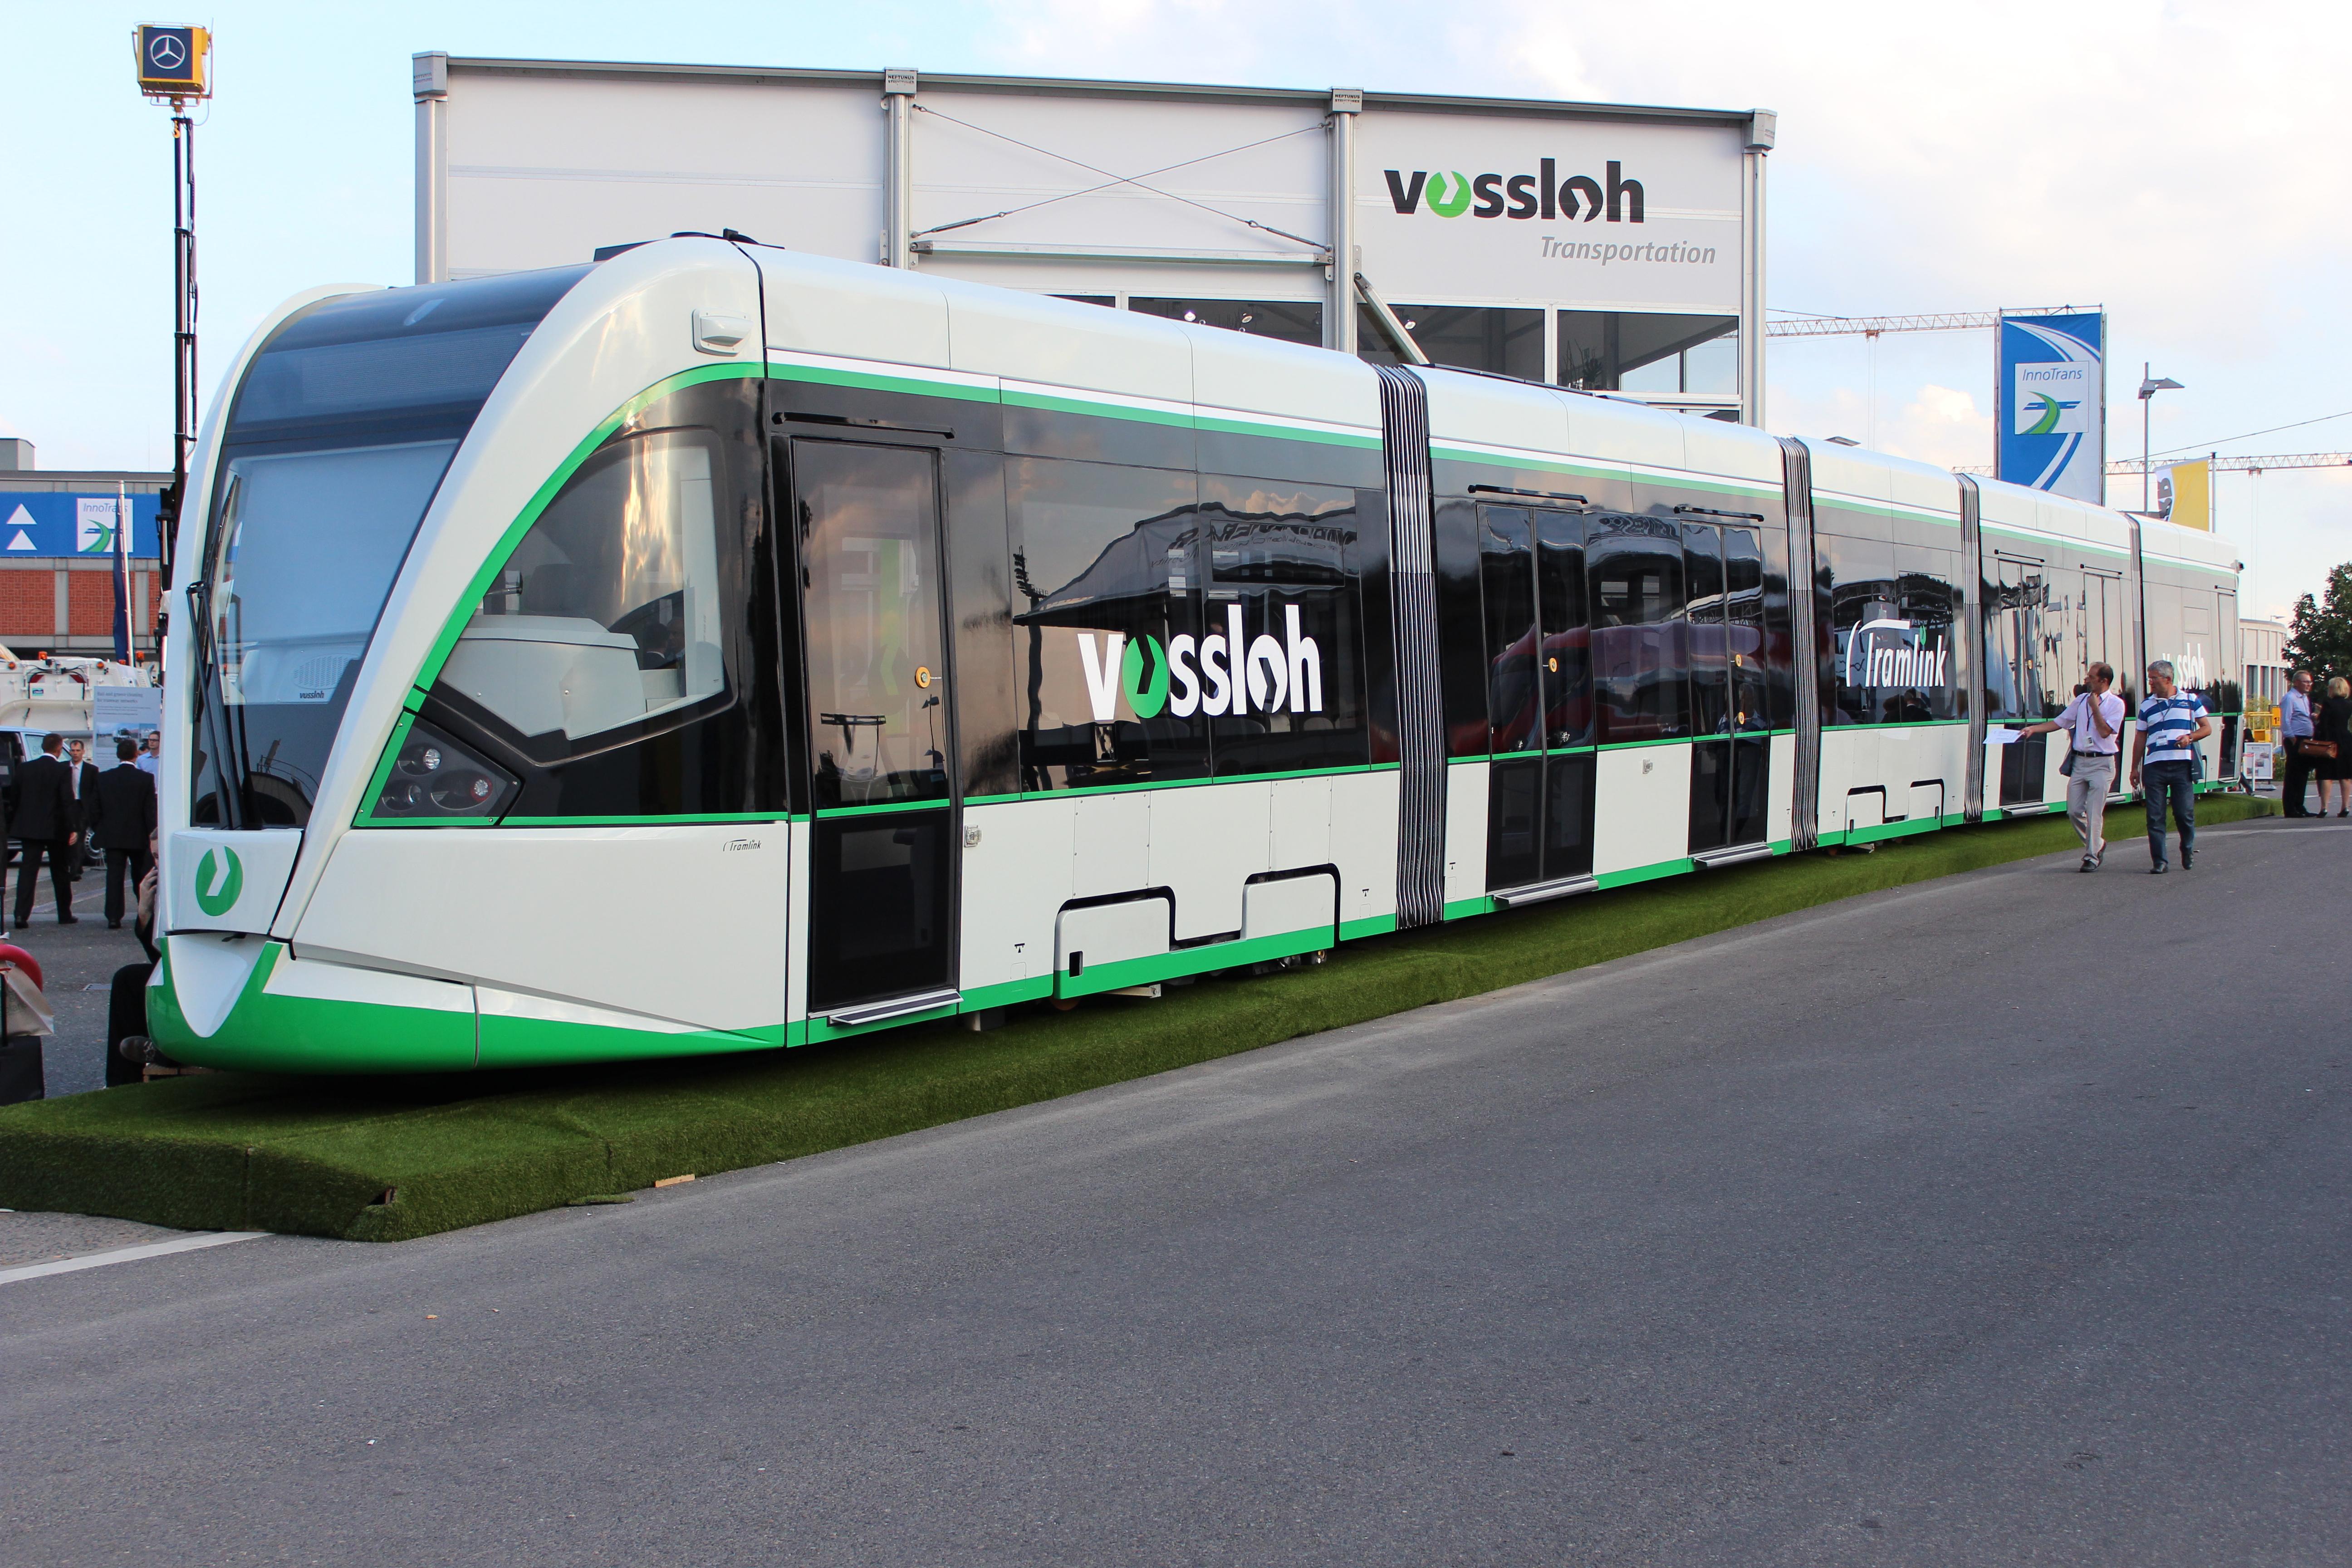 Vossloh Kiepe | OlsztyńskieTramwaje pl